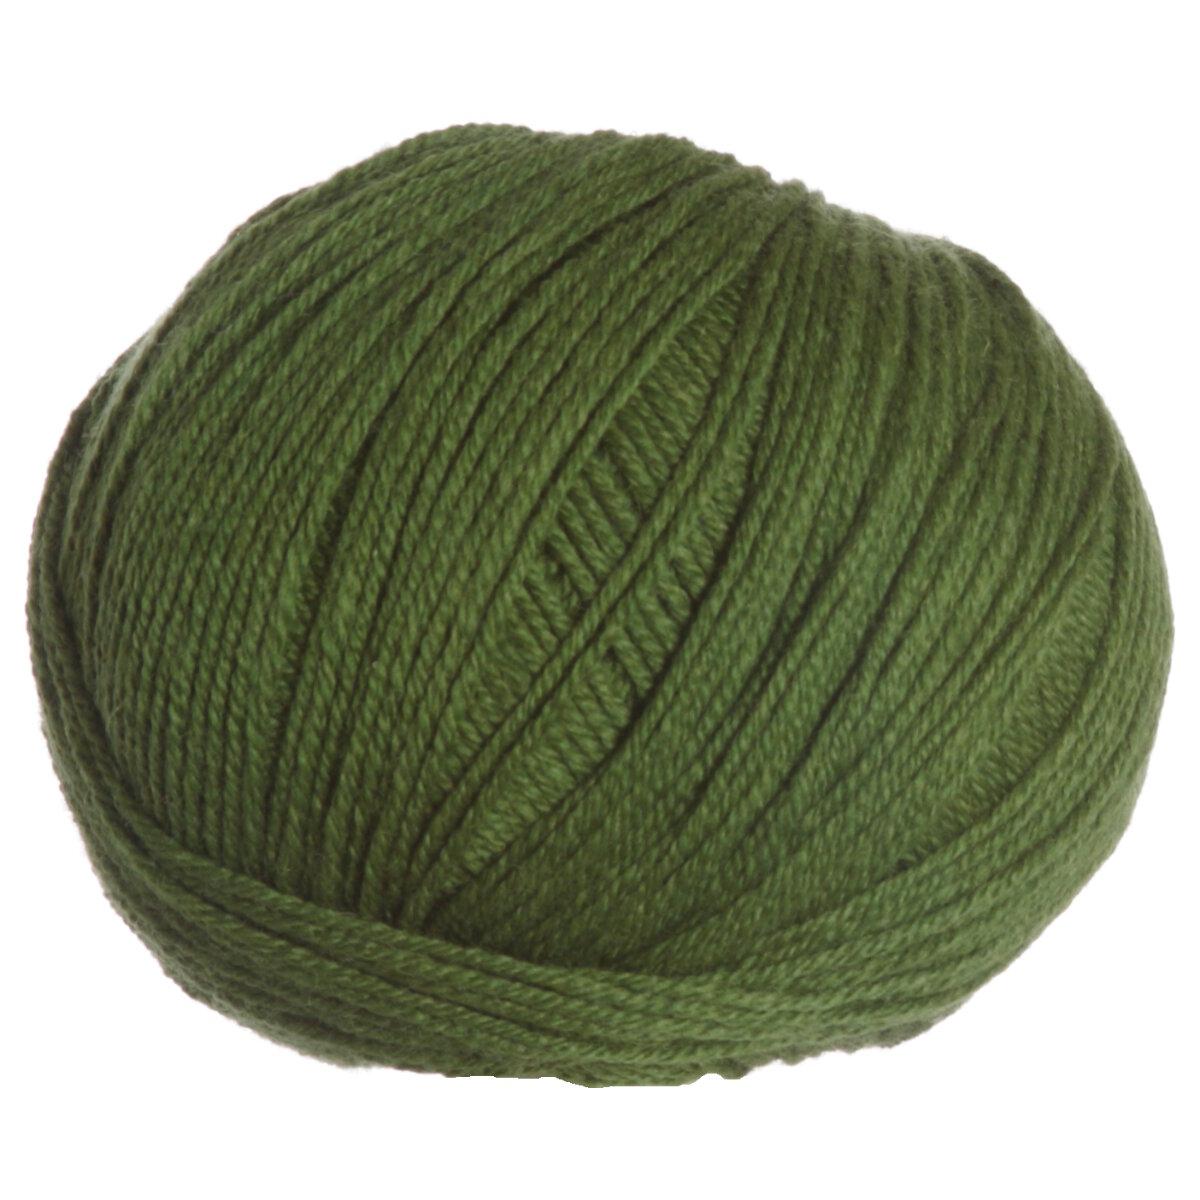 Knitting Patterns Rowan Wool Cotton : Rowan Wool Cotton 4ply Yarn - 508 Glade at Jimmy Beans Wool